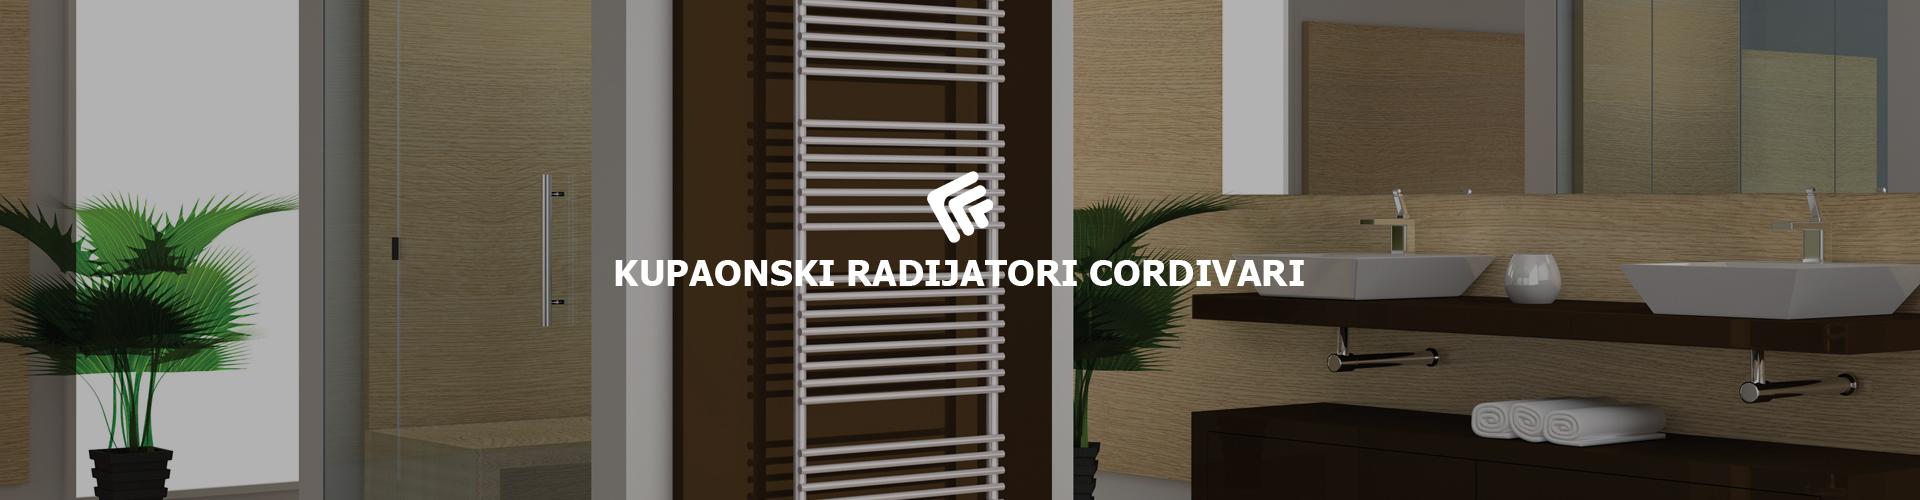 Kupaonski radijatori Cordivari